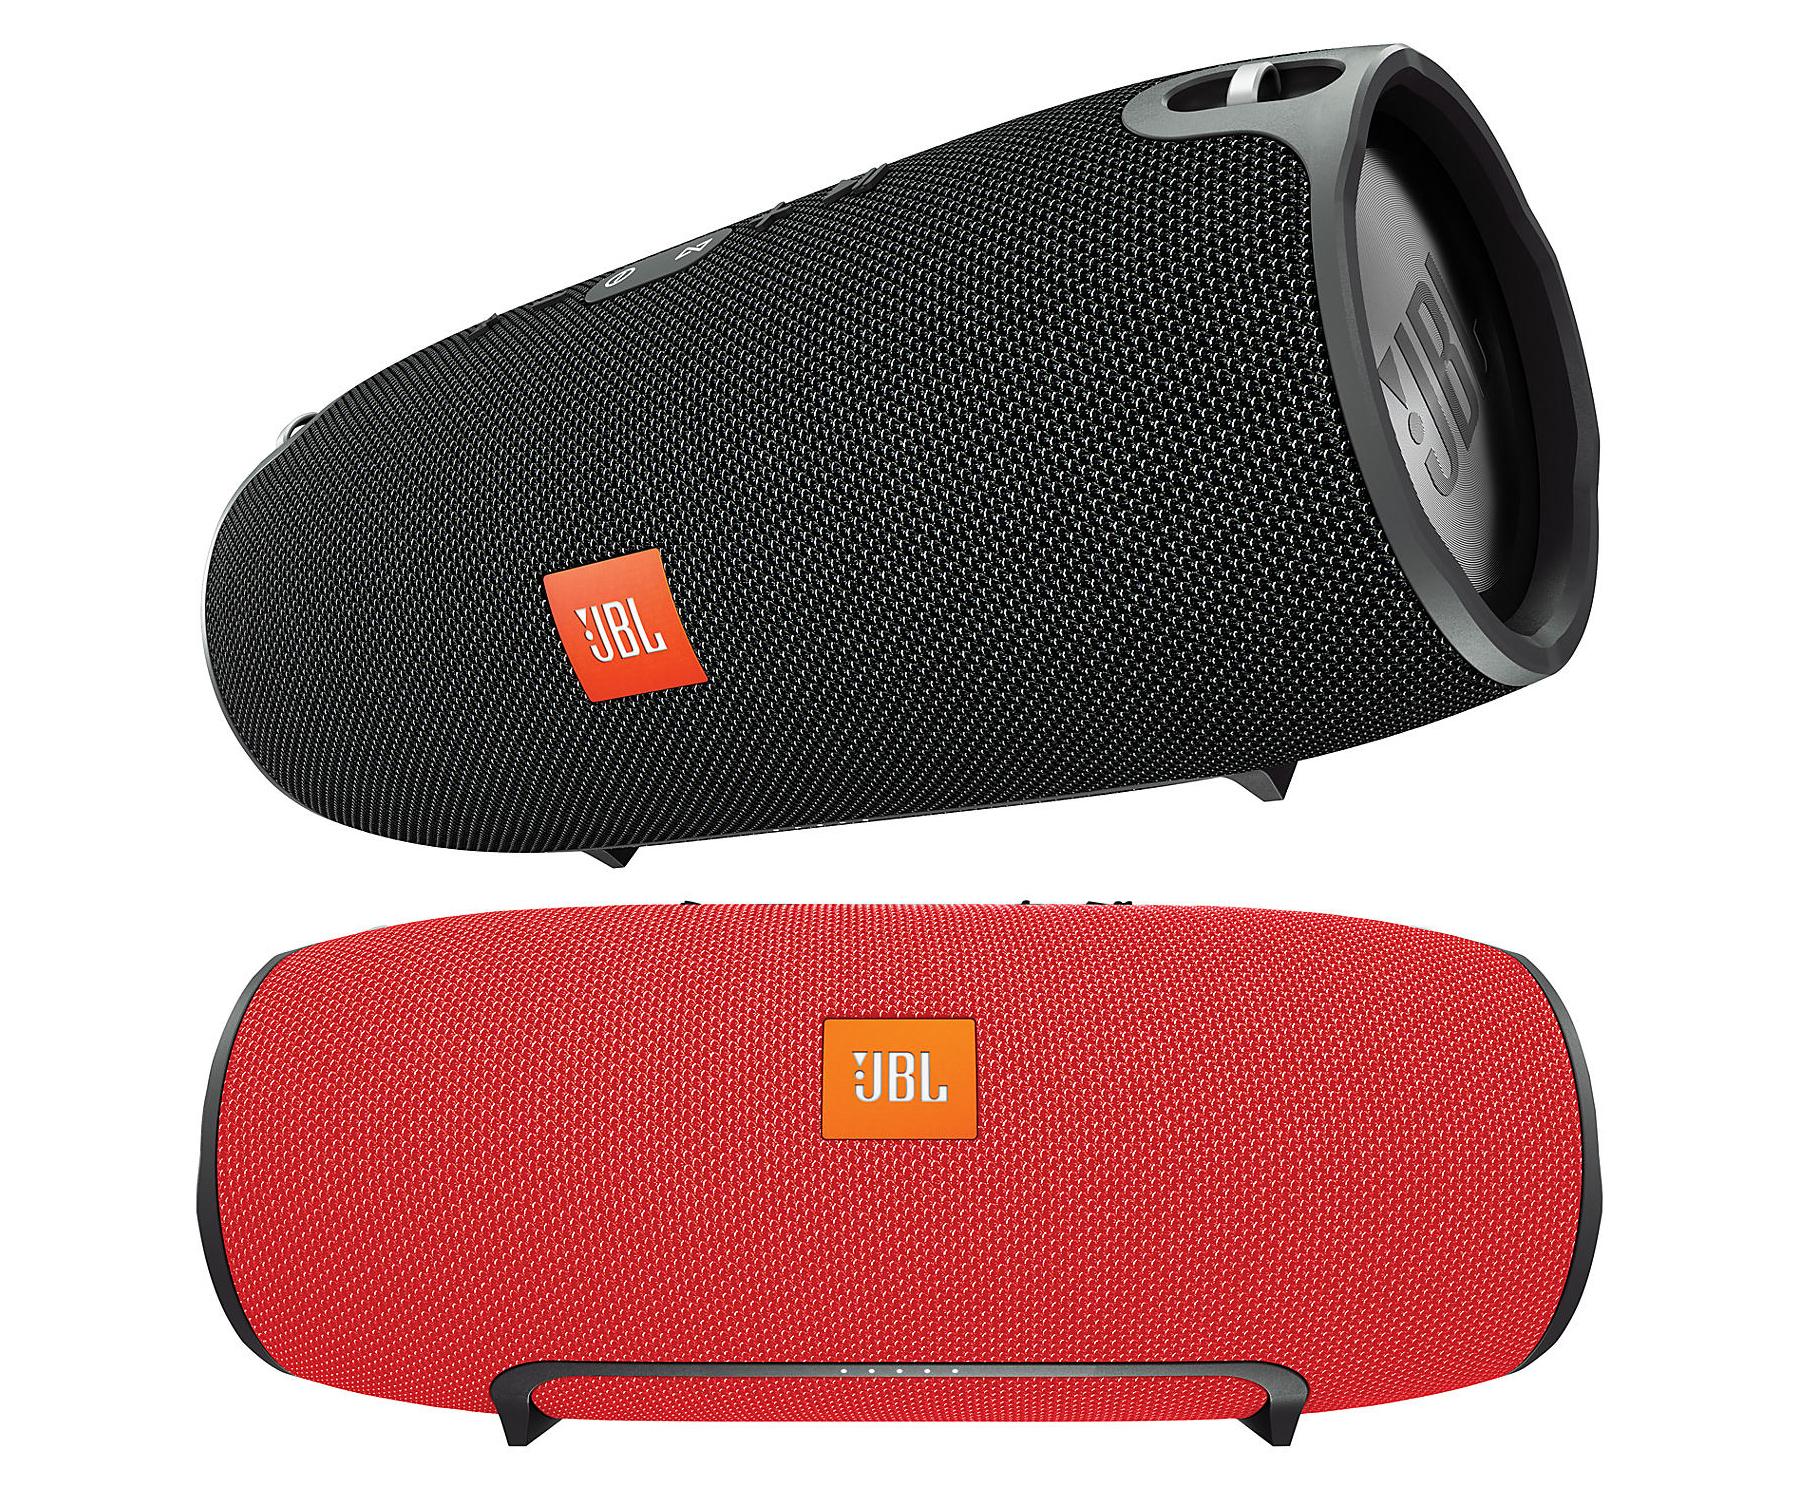 jbl_xtreme_portable_bluetooth_speaker_splashproof.jpg